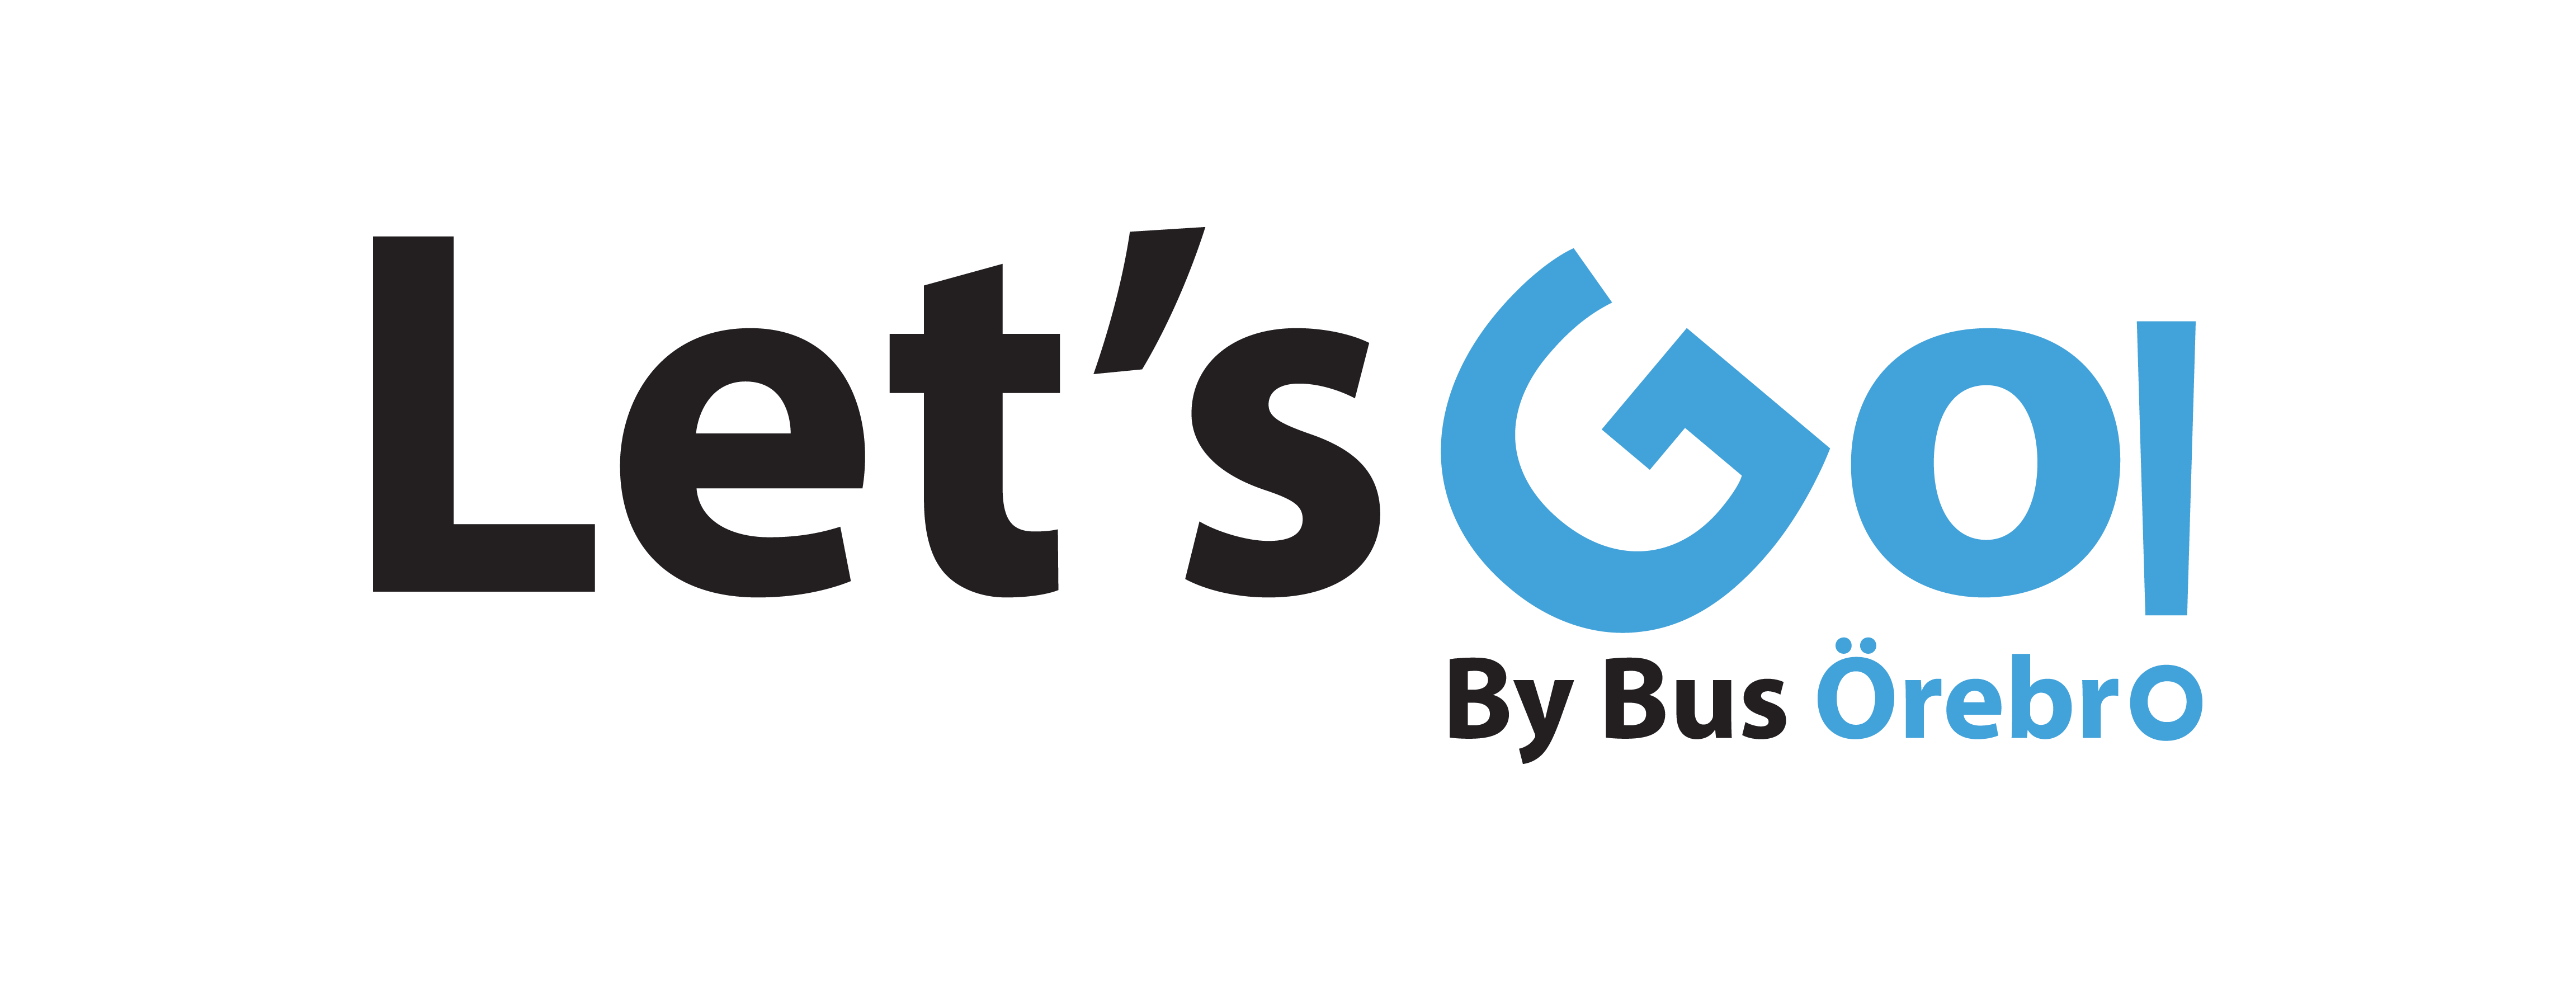 Bus Partnerships: FlixBus Cooperation with Regional SMEs